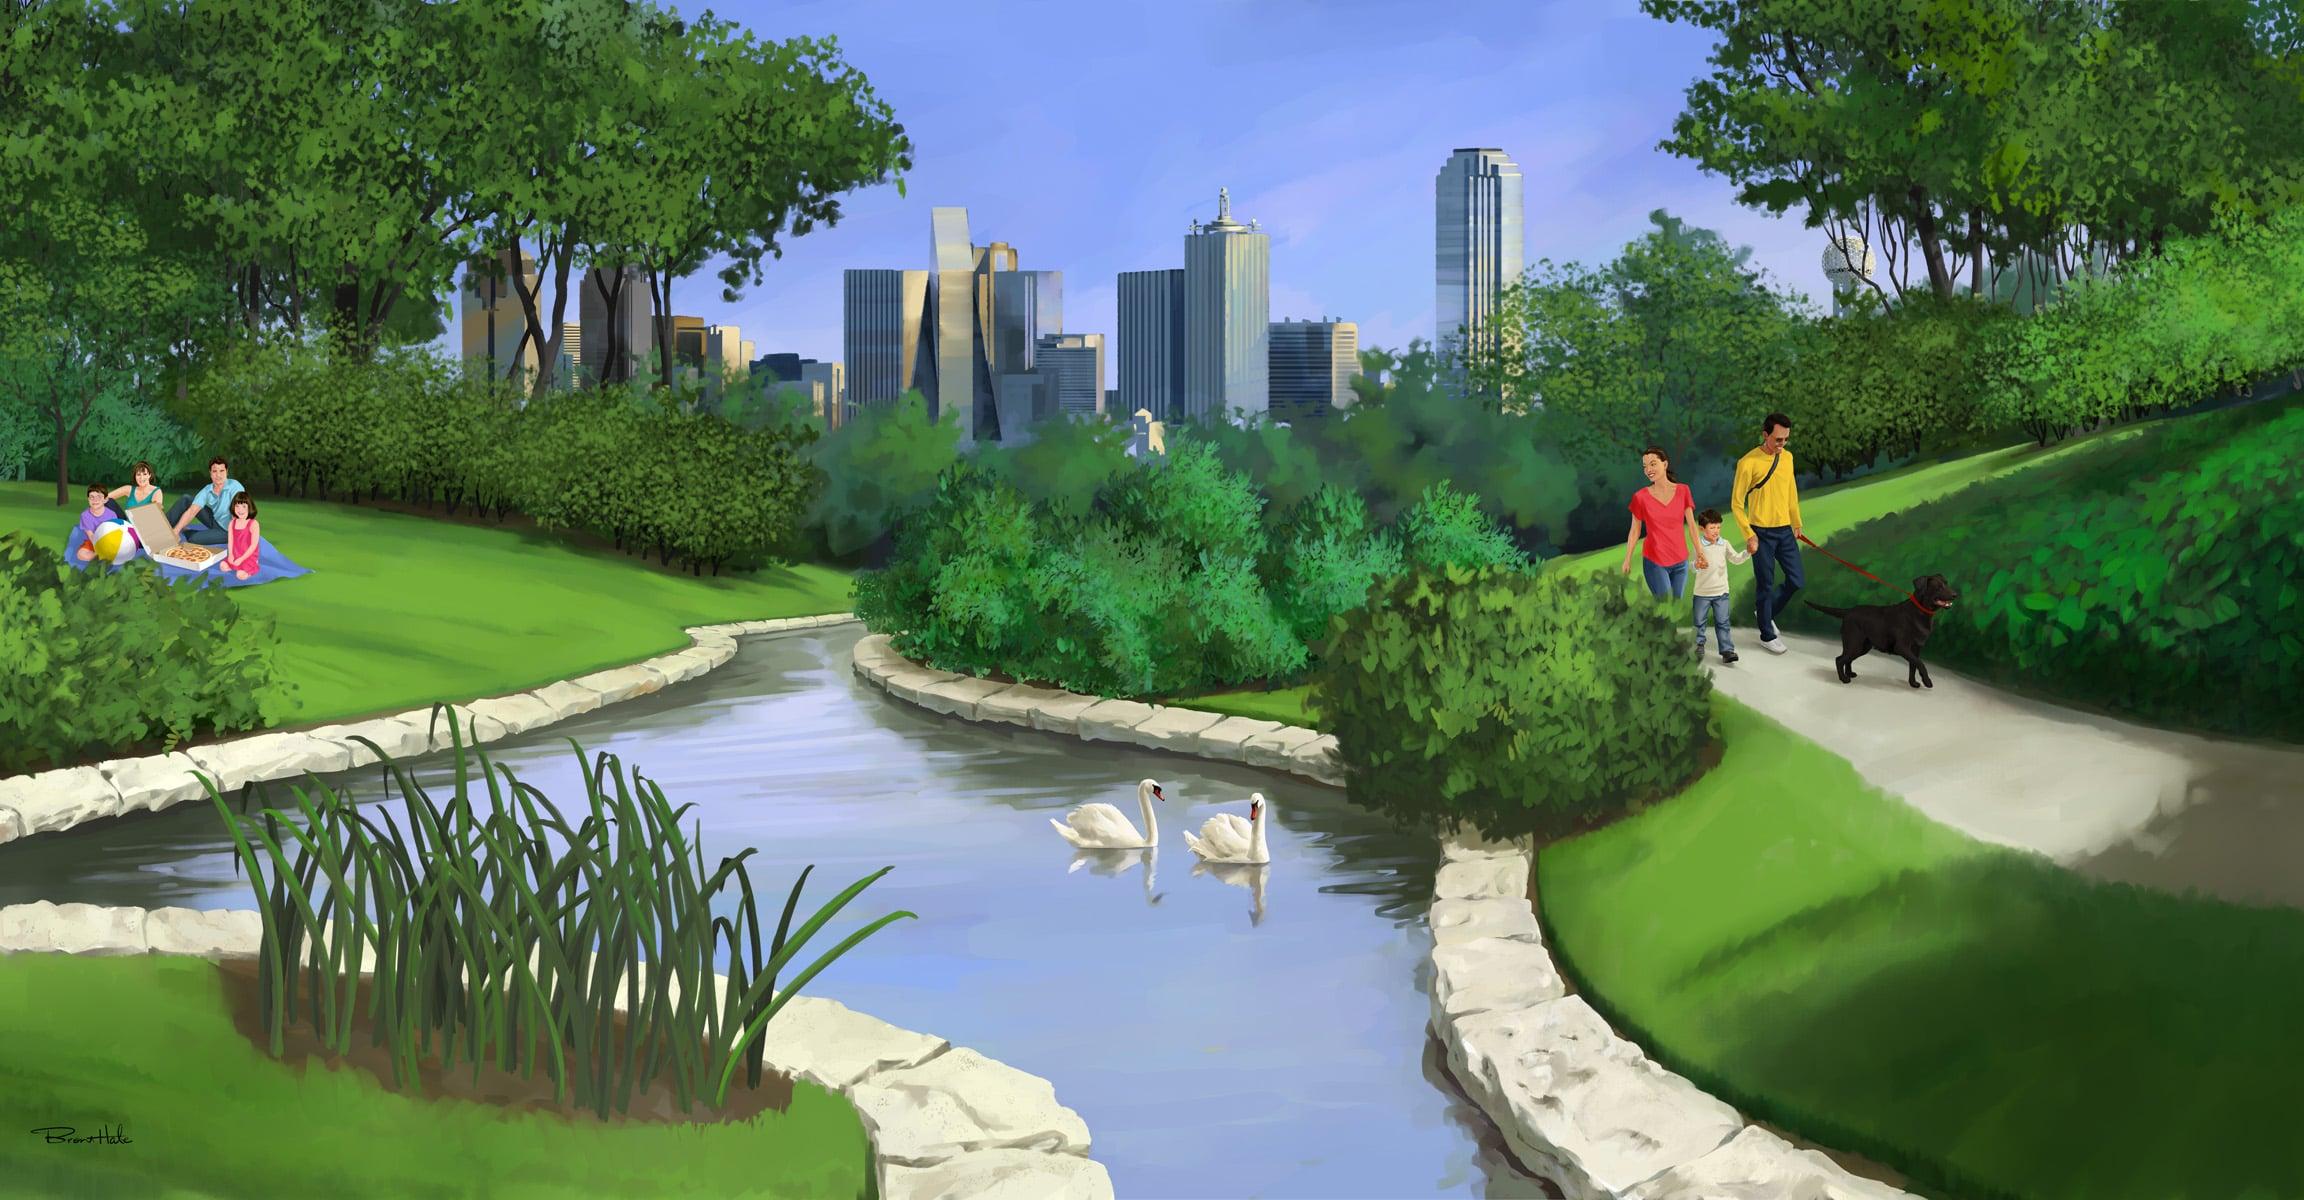 GattiTown Mural Turtle Creek Park